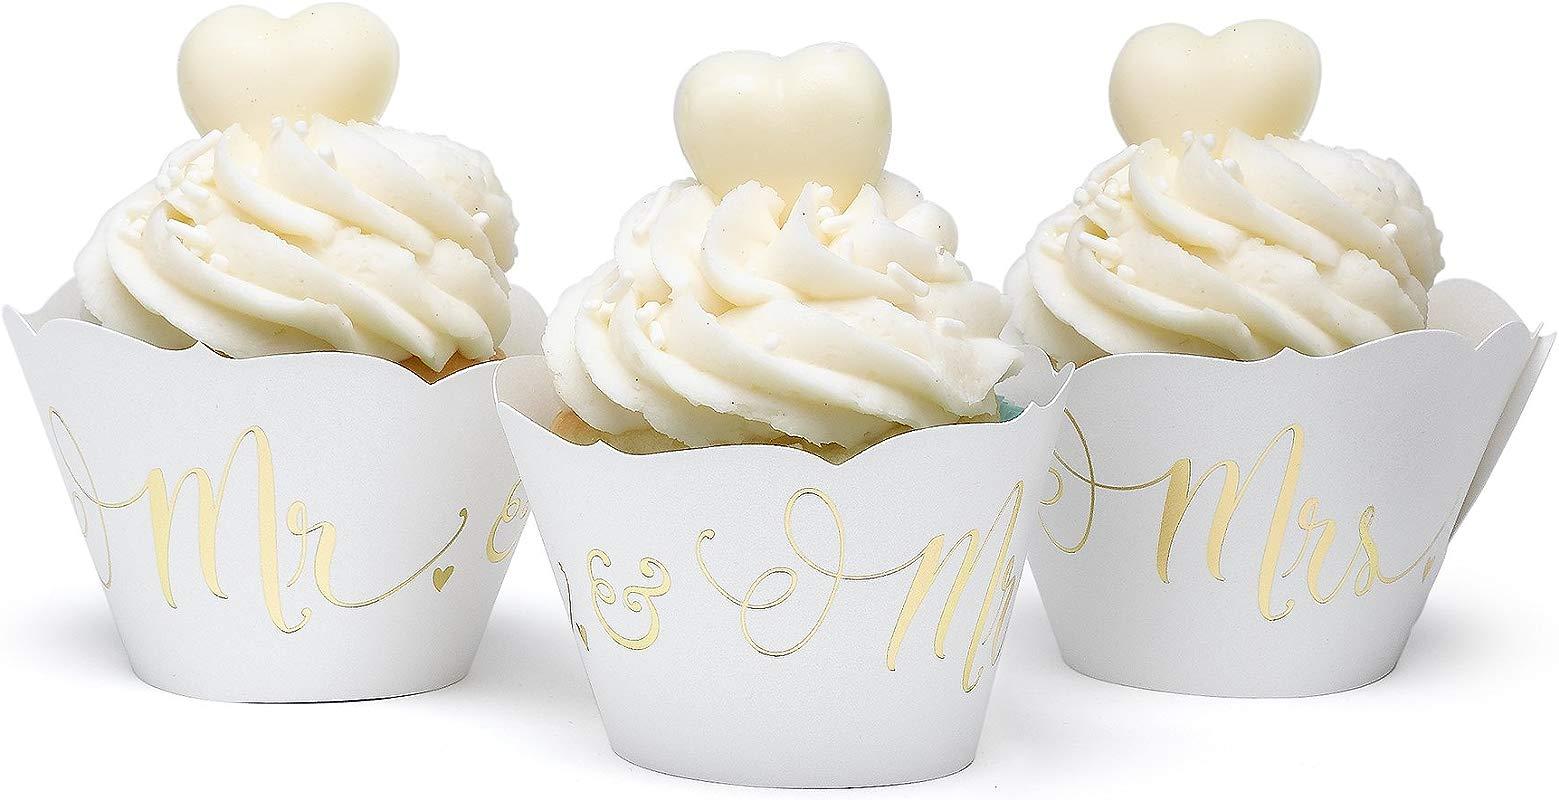 Hortense B Hewitt 55539 Gold Mrs Cupcake Wraps